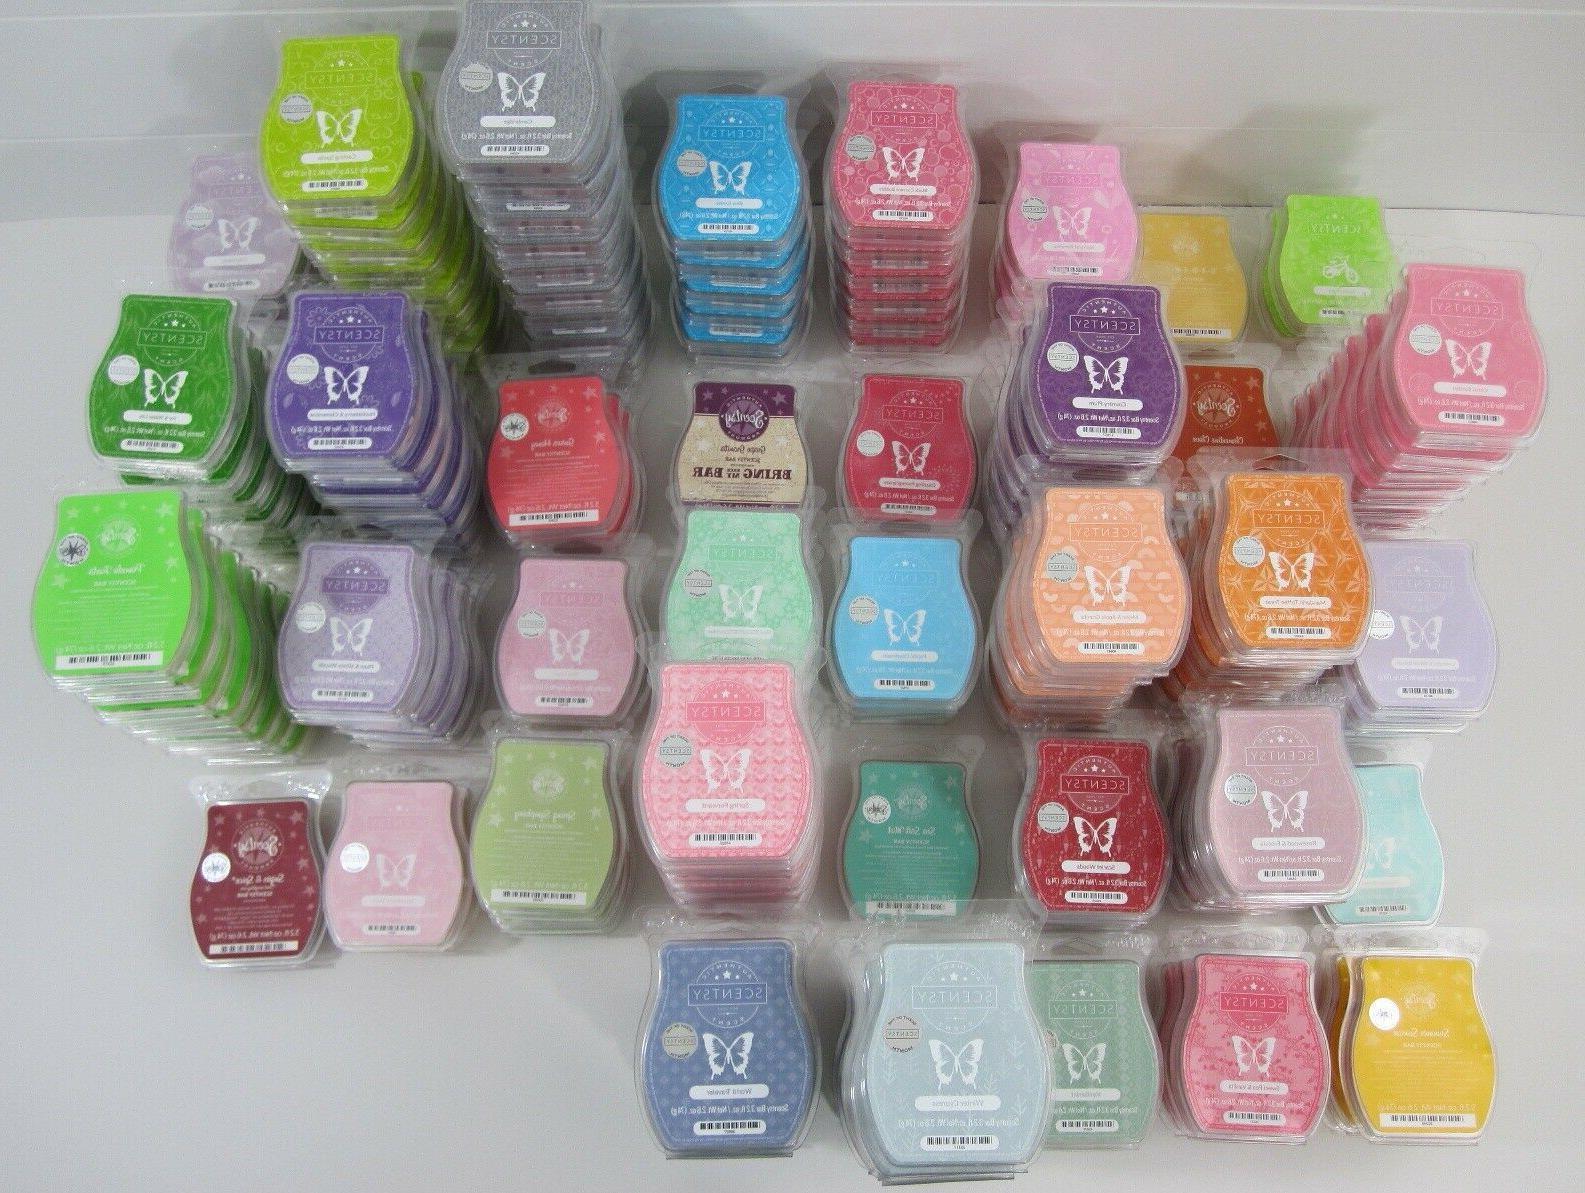 Scentsy Wax Bars 3.2 fl. Choose - Buy 2 More